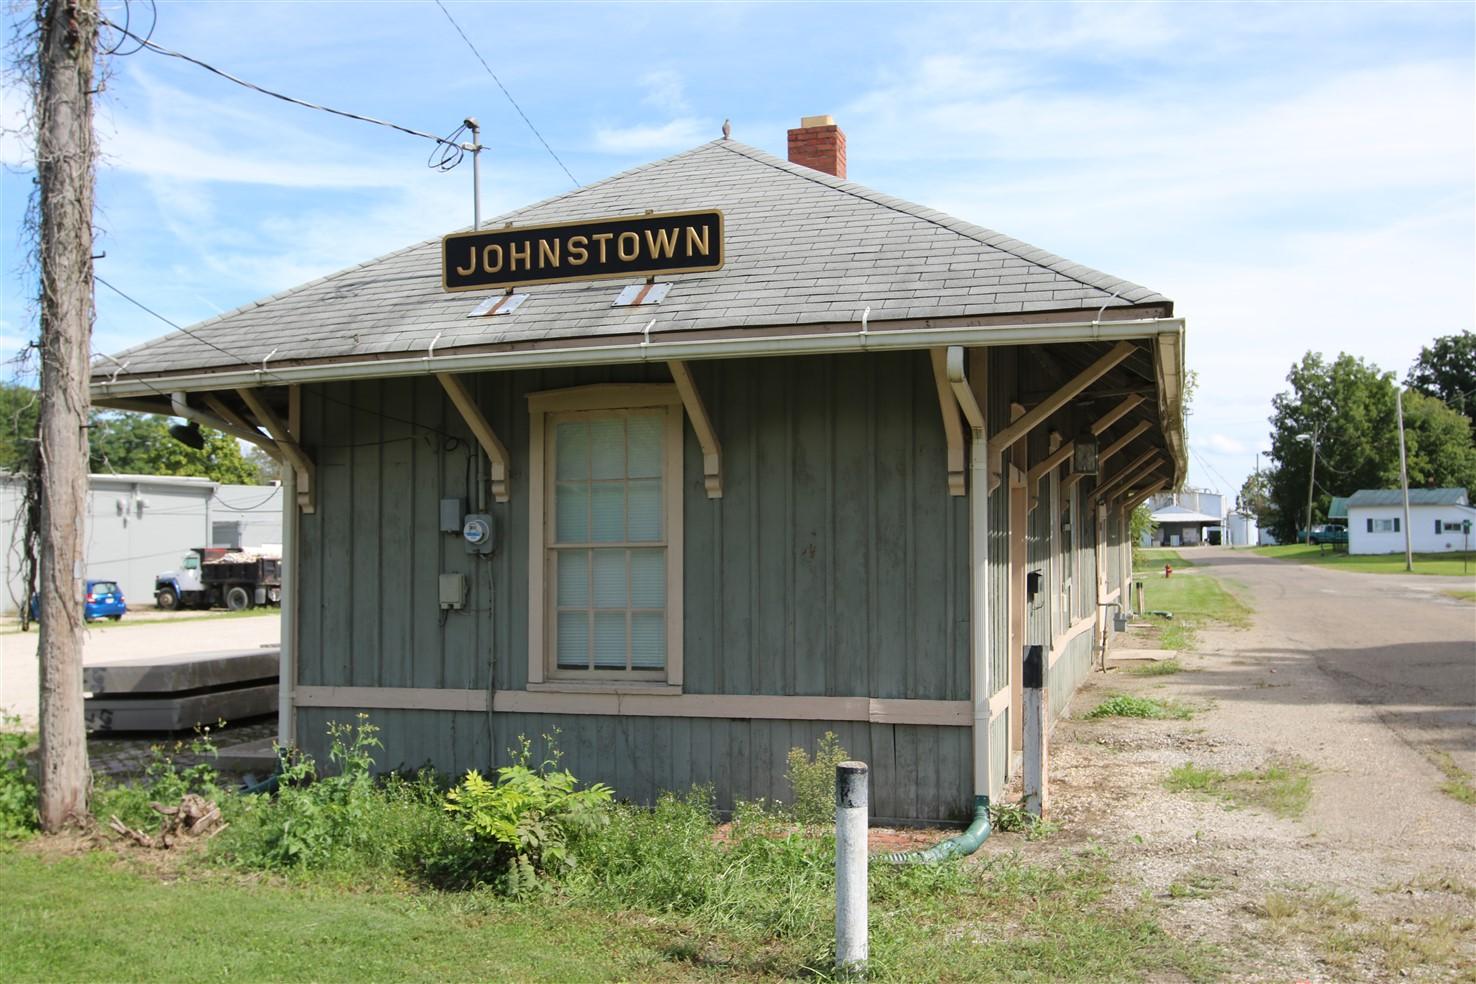 2018 09 16 470 Johnstown OH Train Depot.jpg